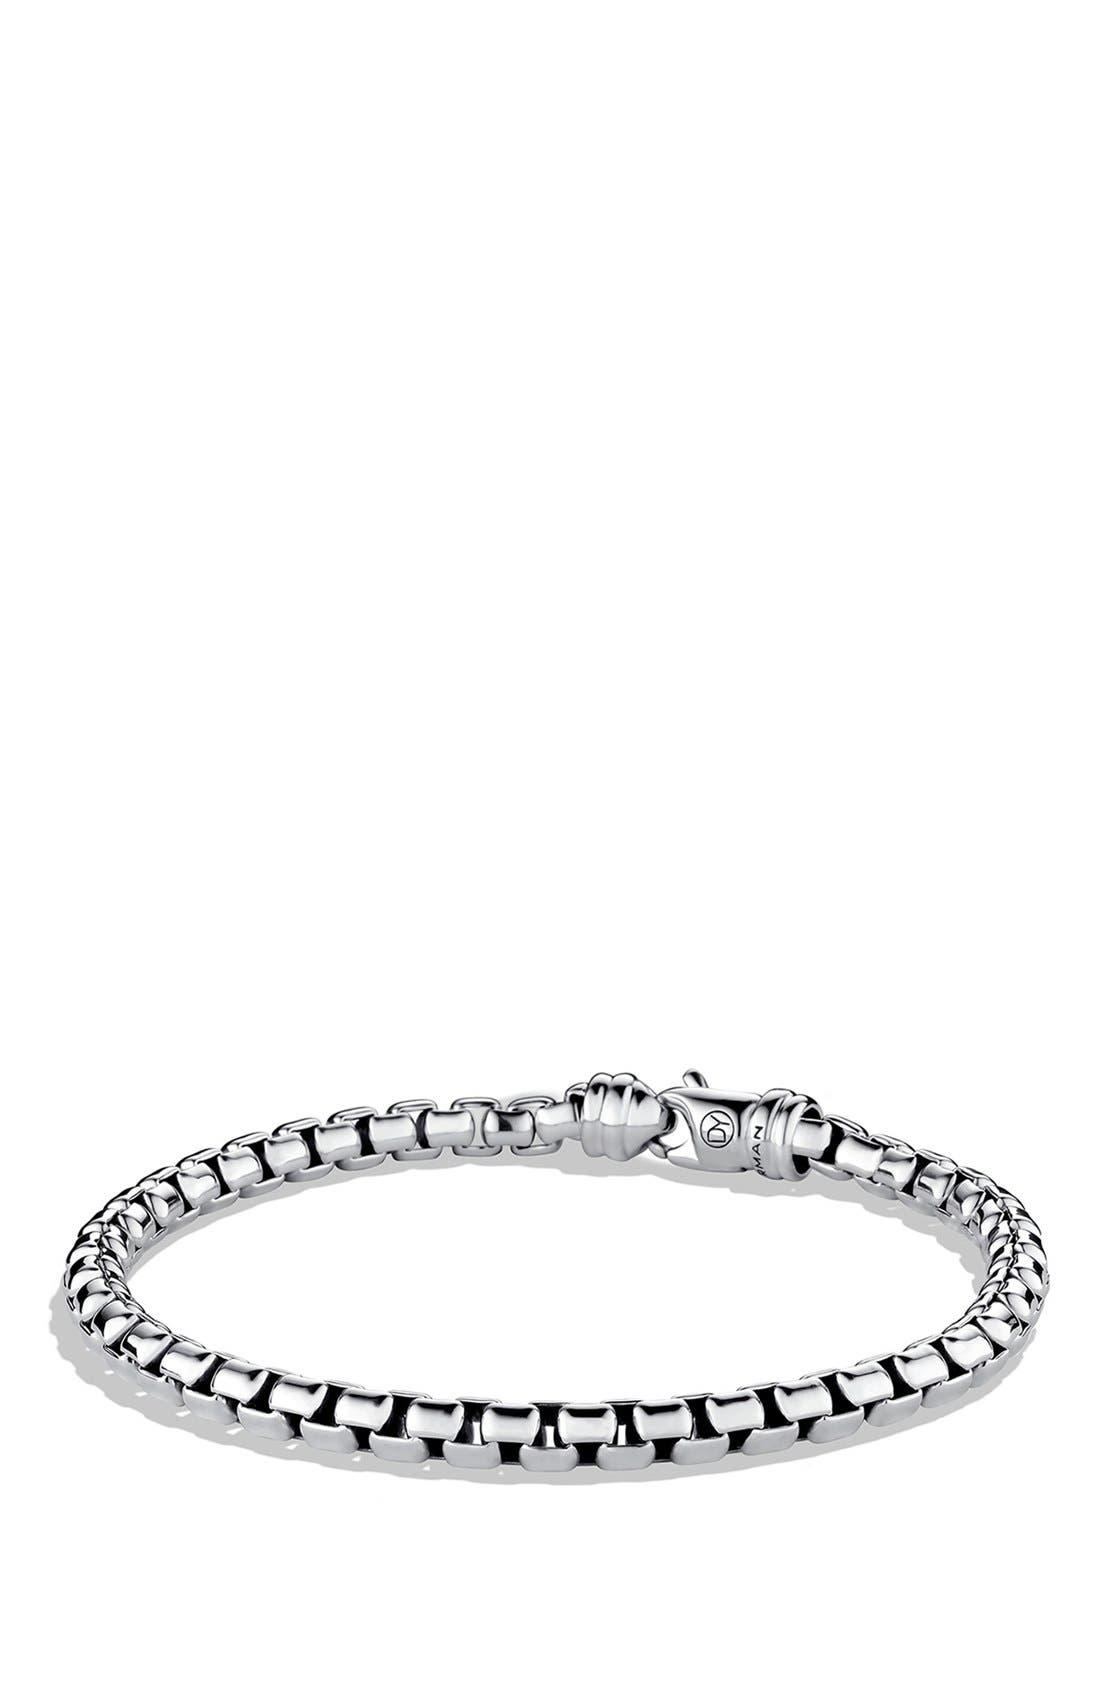 DAVID YURMAN, 'Chain' Large Link Box Chain Bracelet, Main thumbnail 1, color, SILVER